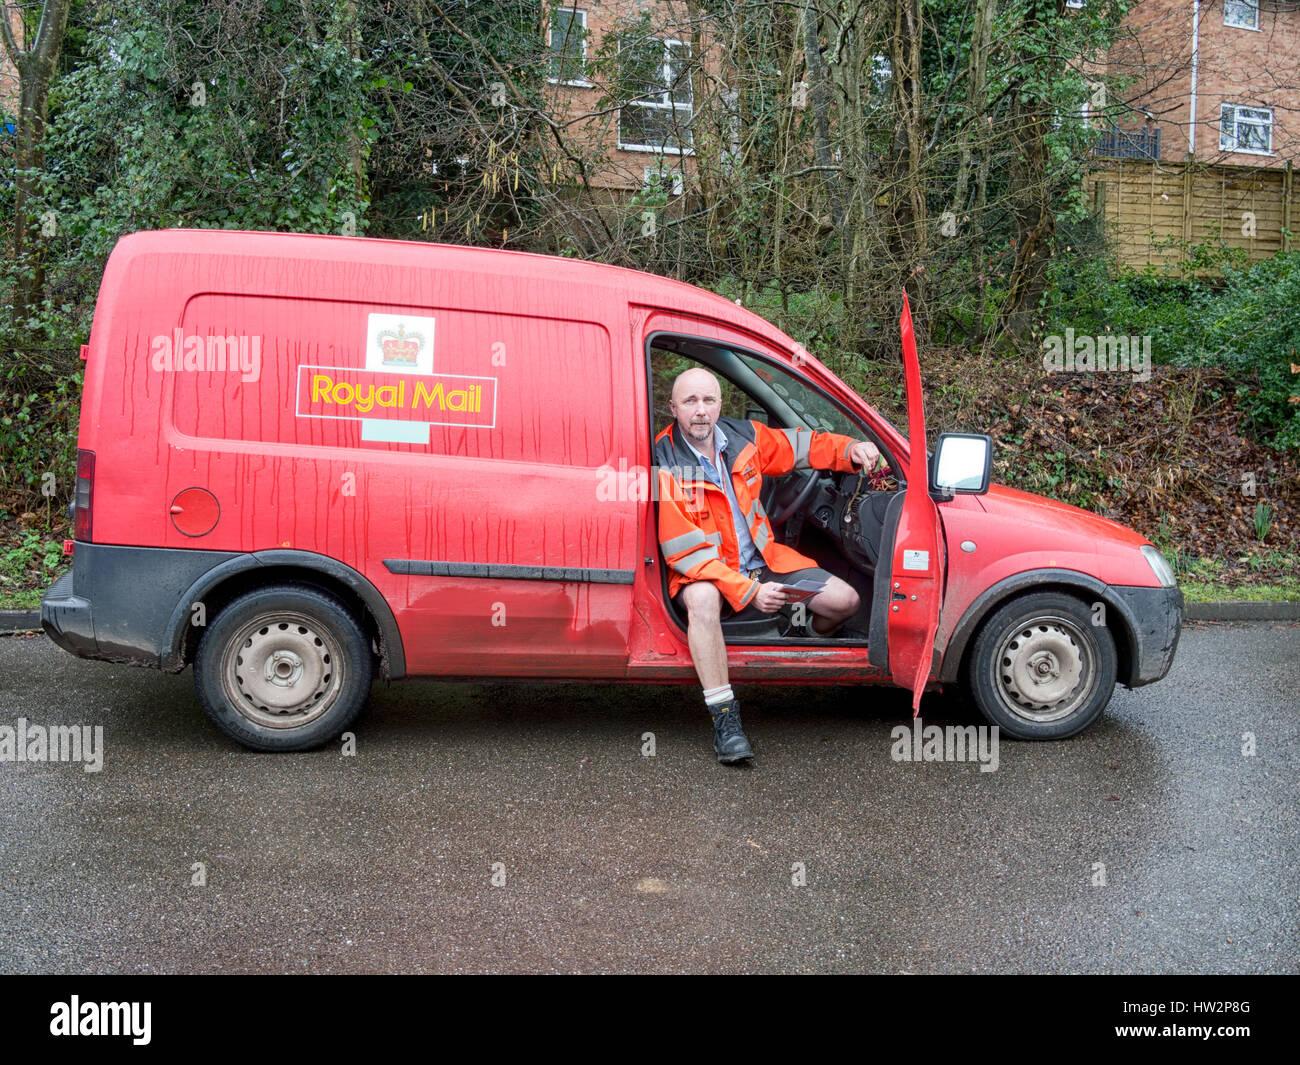 Rural postal service, England, UK. Royal Mail. - Stock Image